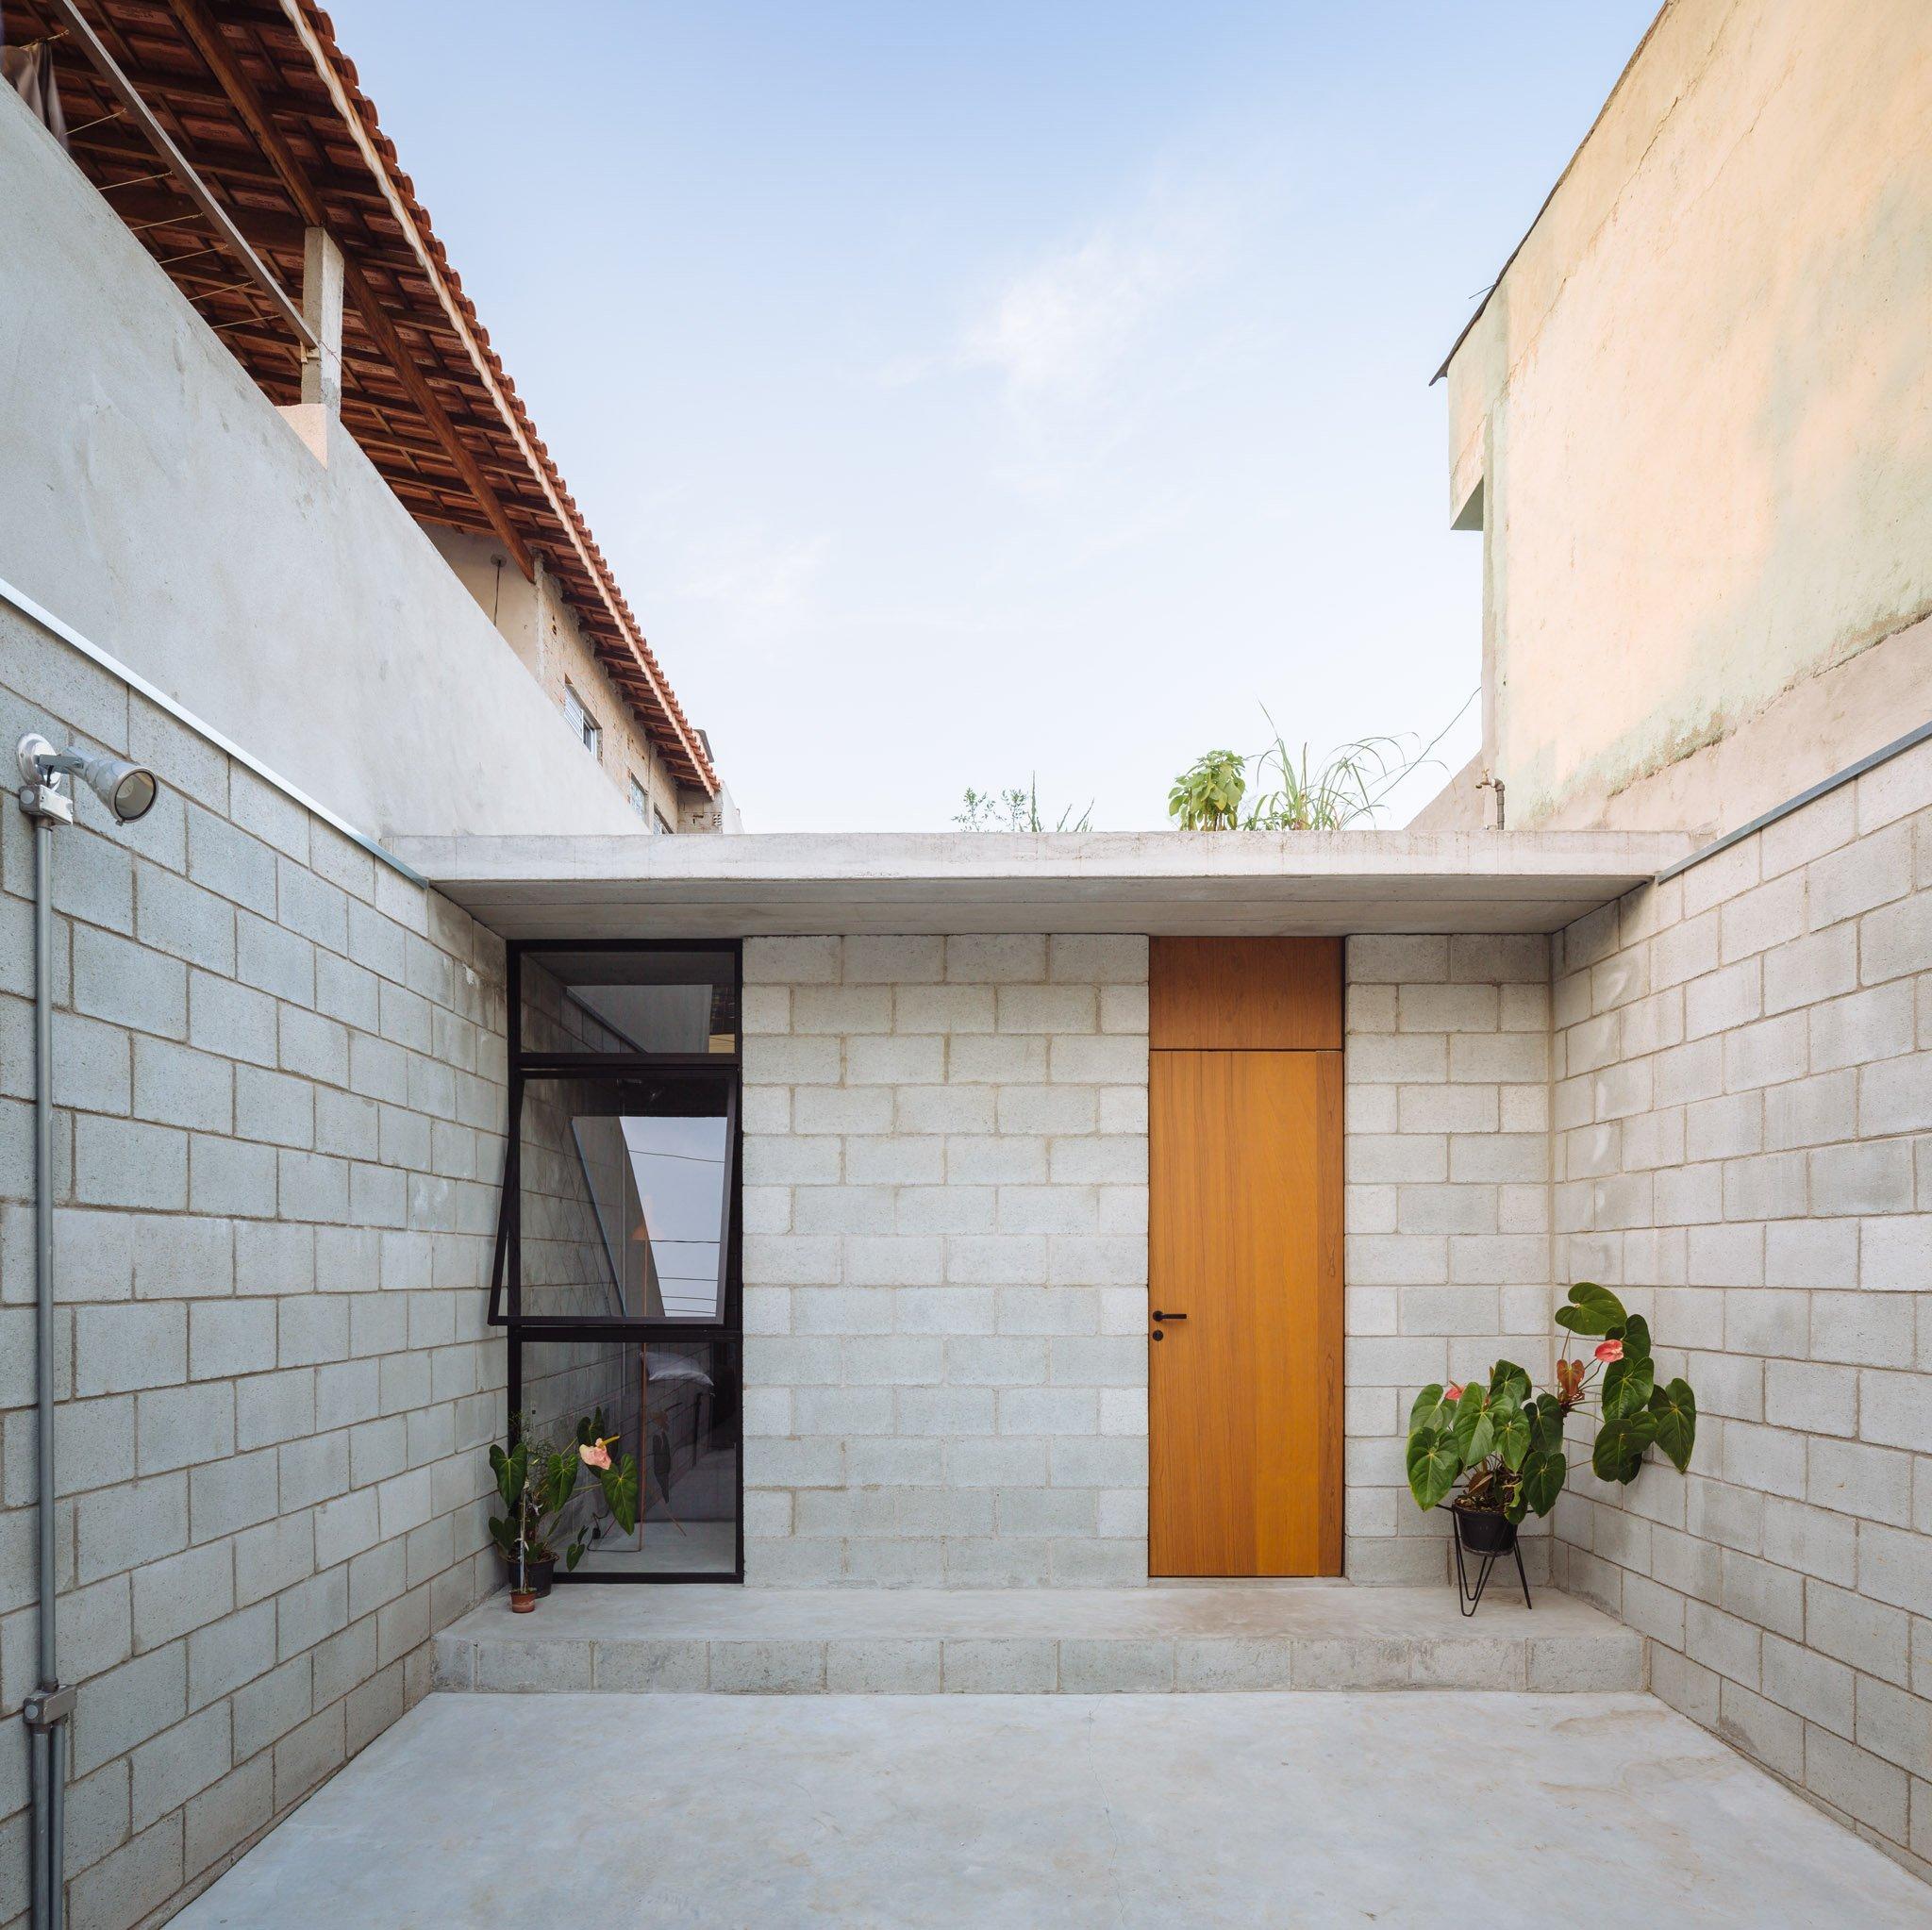 Empleada dom stica gan premio internacional de arquitectura - Arquitectura de casas ...